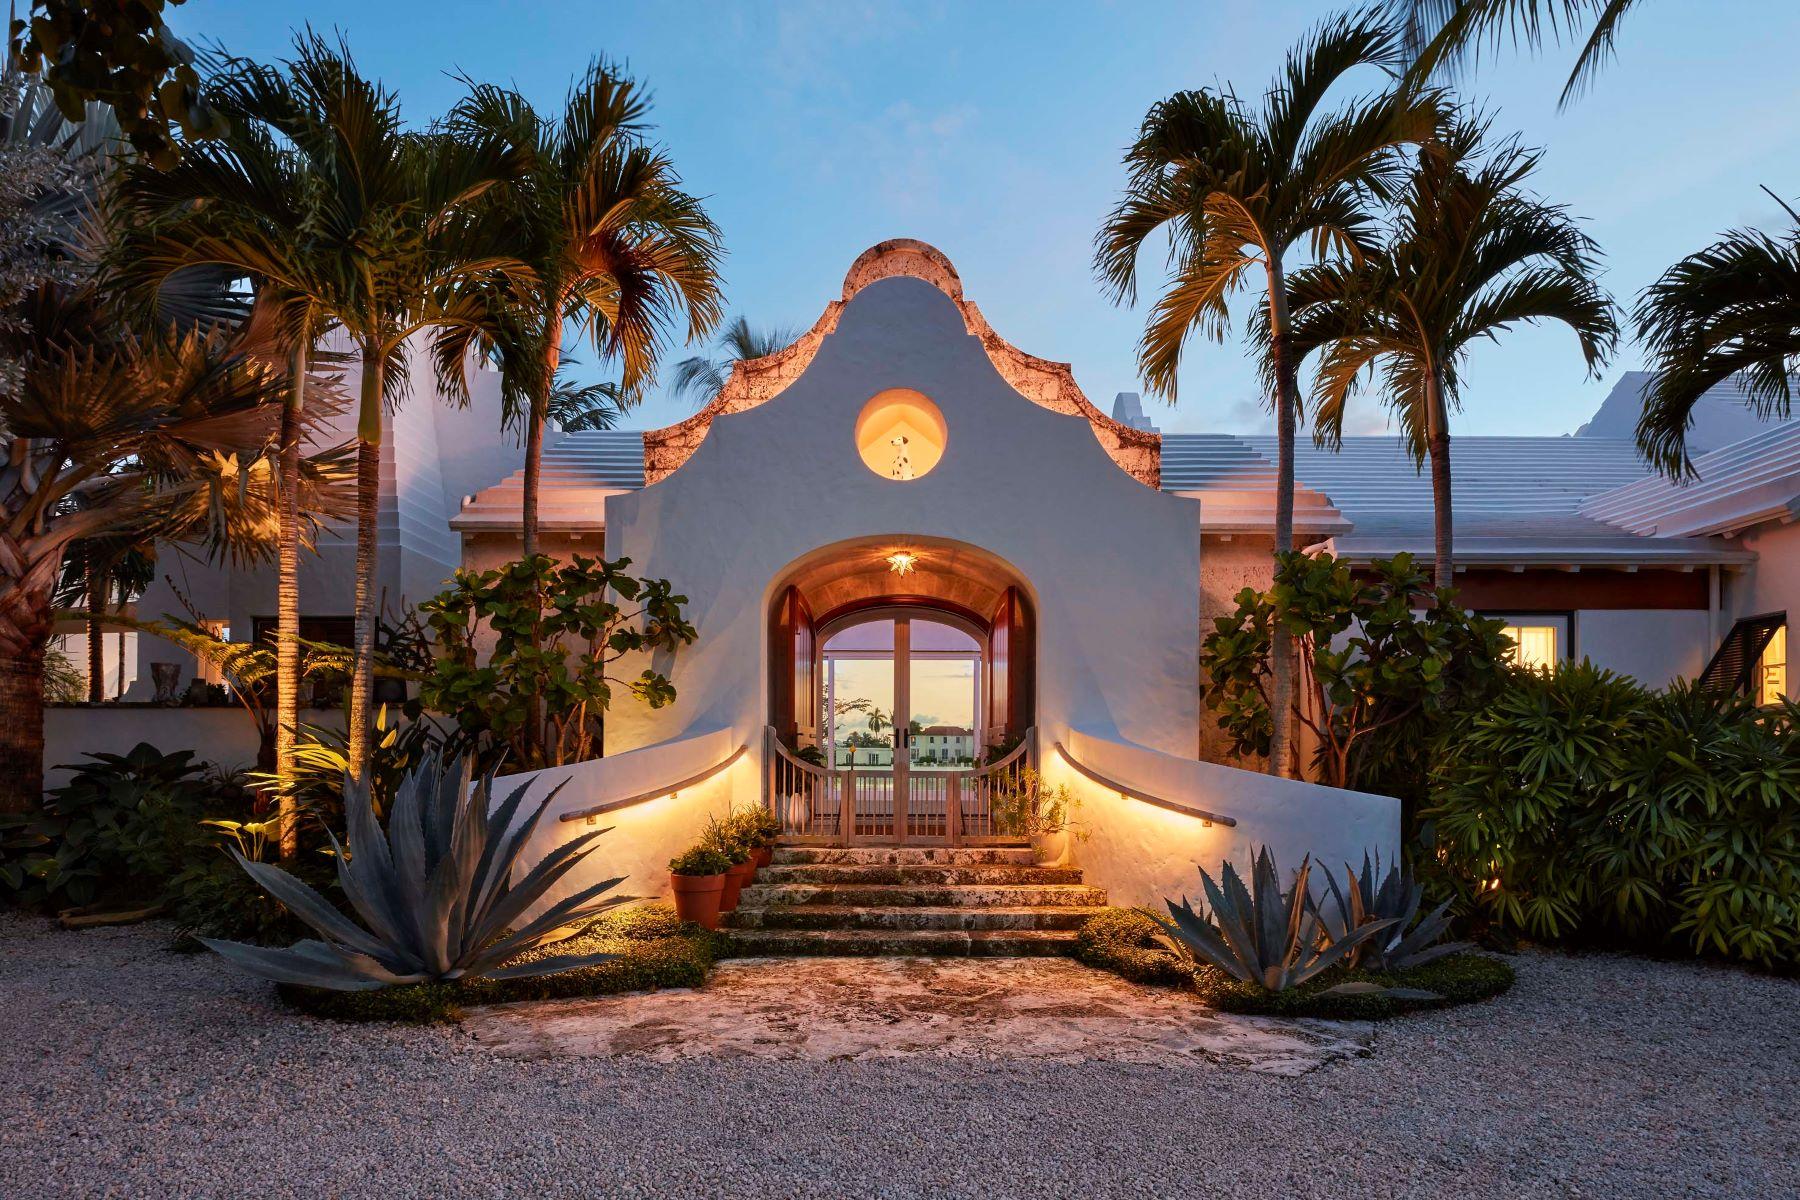 Single Family Homes for Sale at Tarpon Cove 320 Island Road Palm Beach, Florida 33480 United States